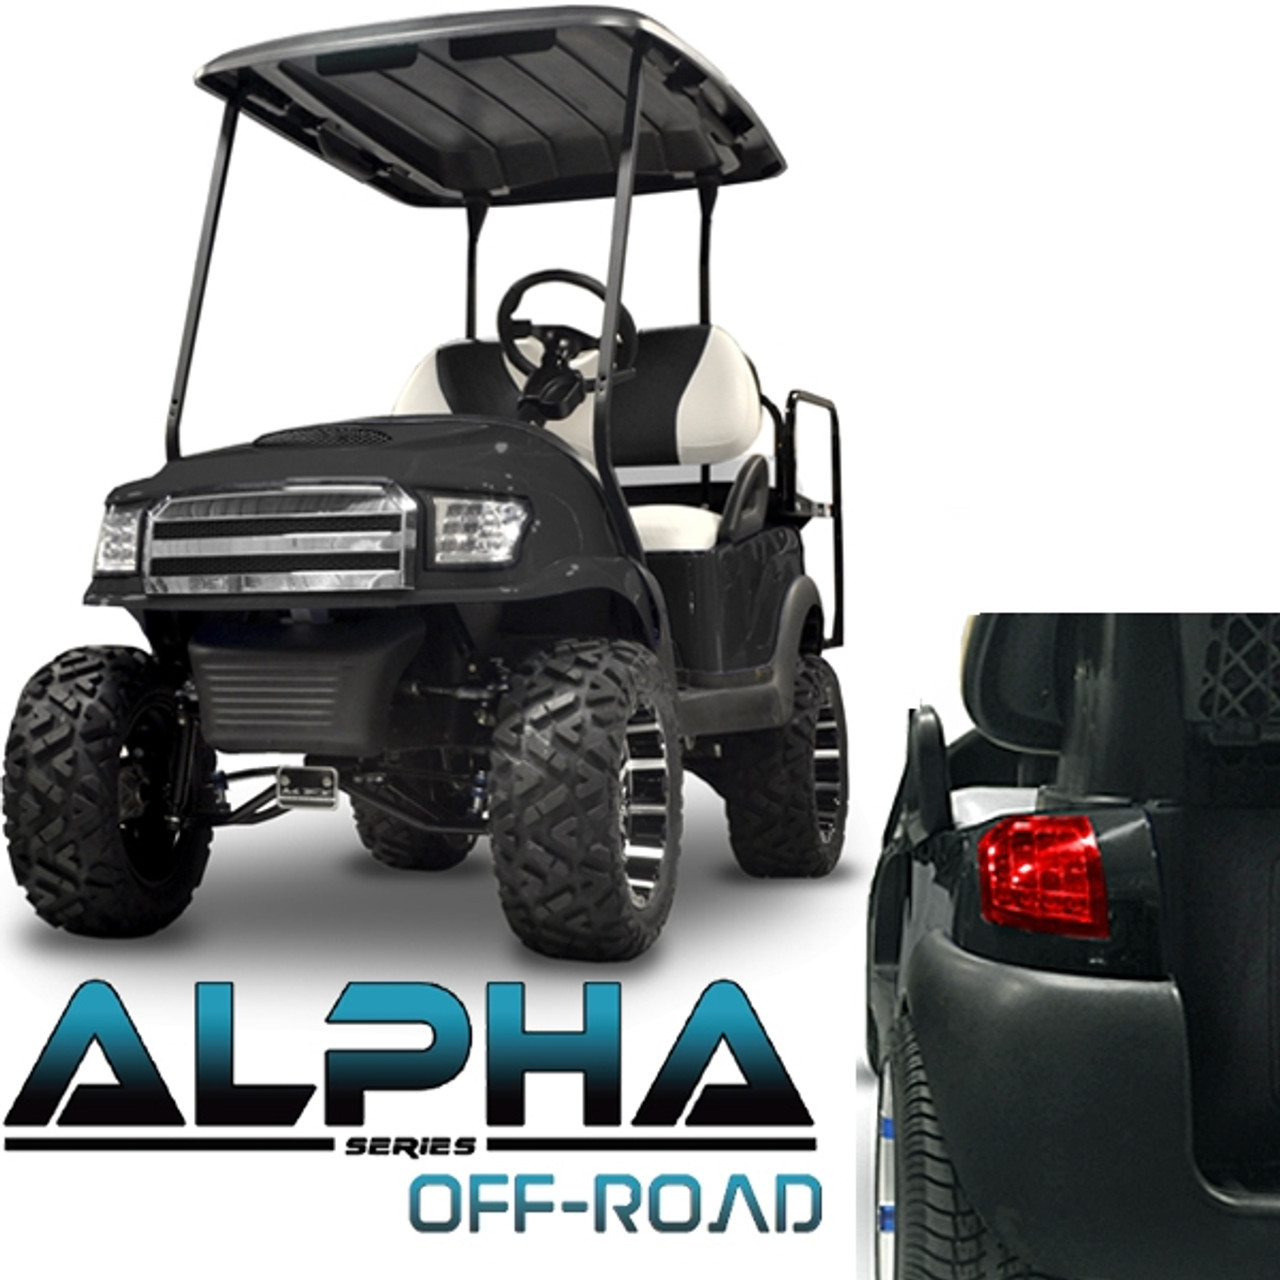 Club Car Precedent ALPHA Off-Road Body Kit in Black (Fits 2004-Up)